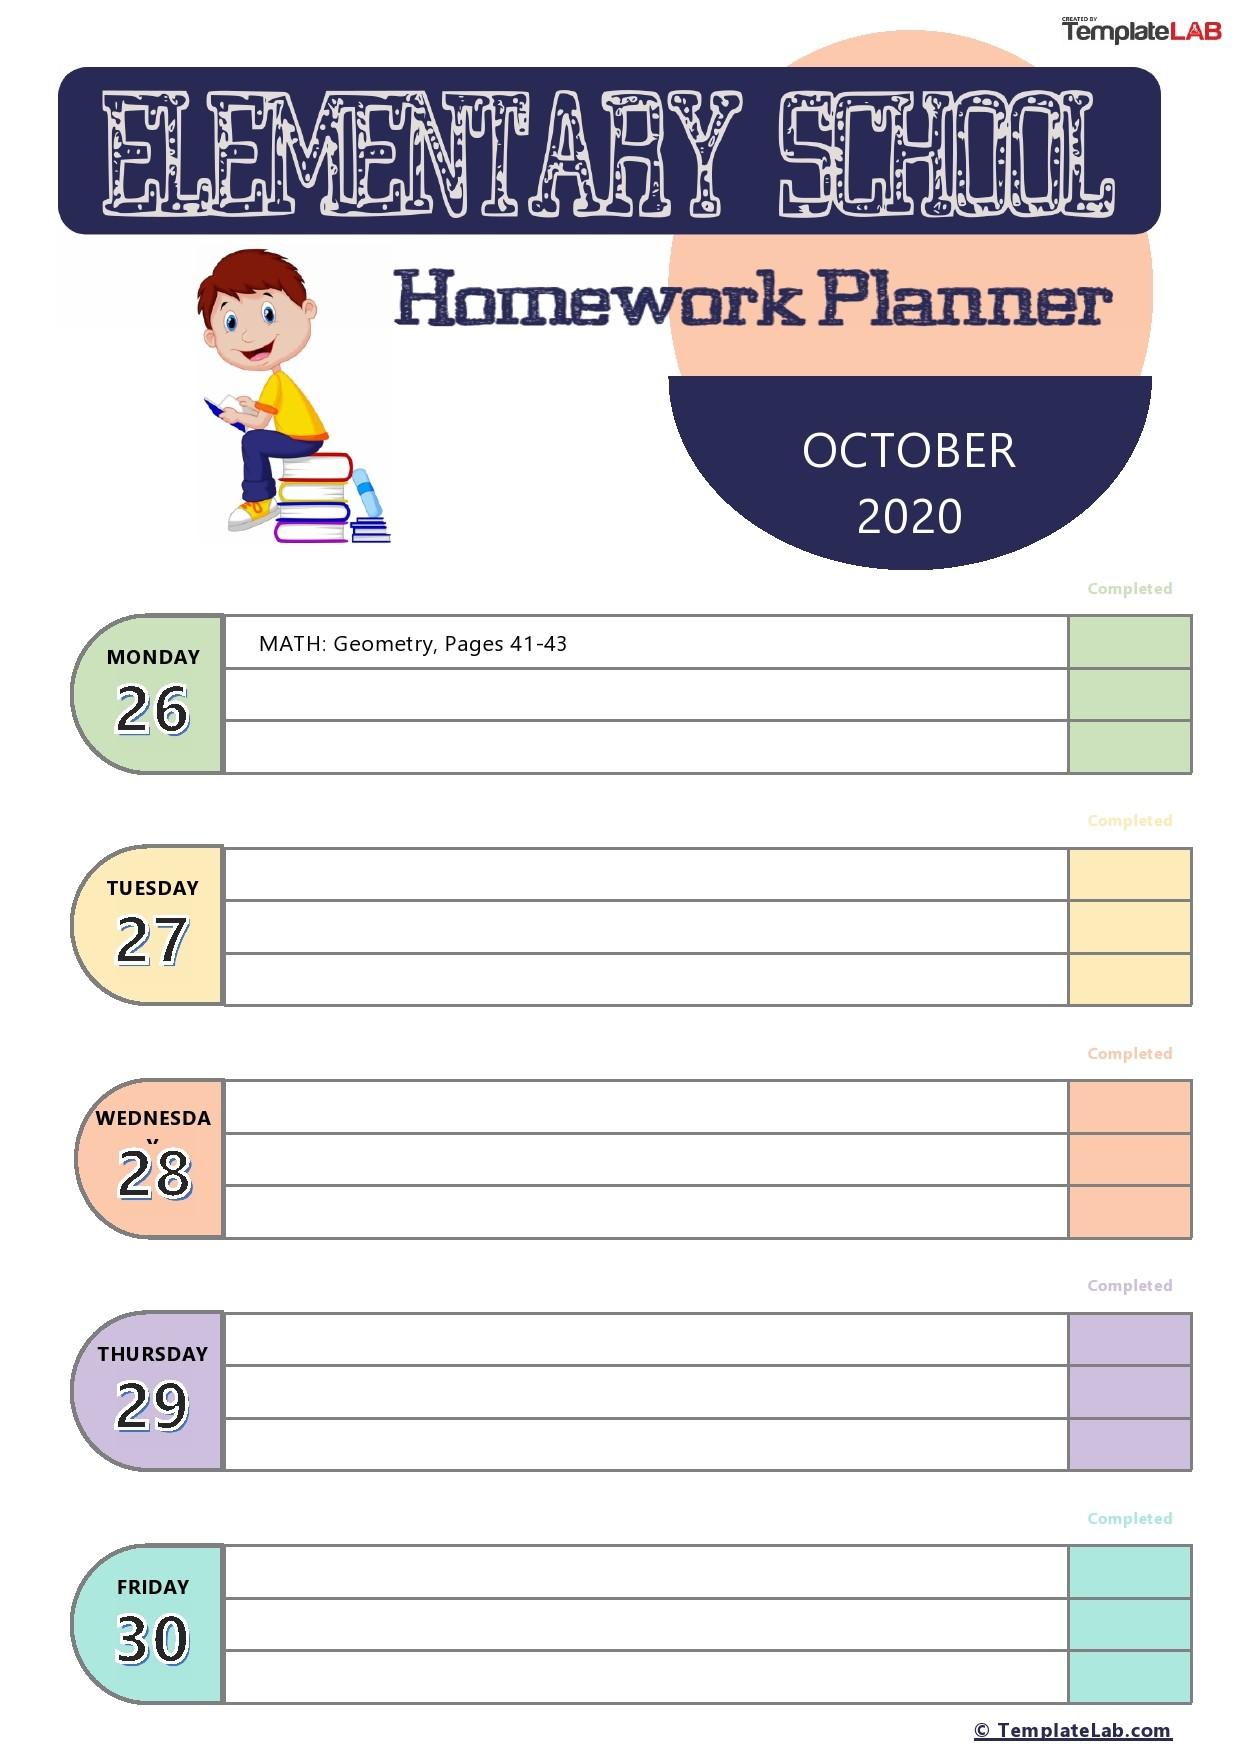 Free Elementary School Homework Planner Template - TemplateLab.com